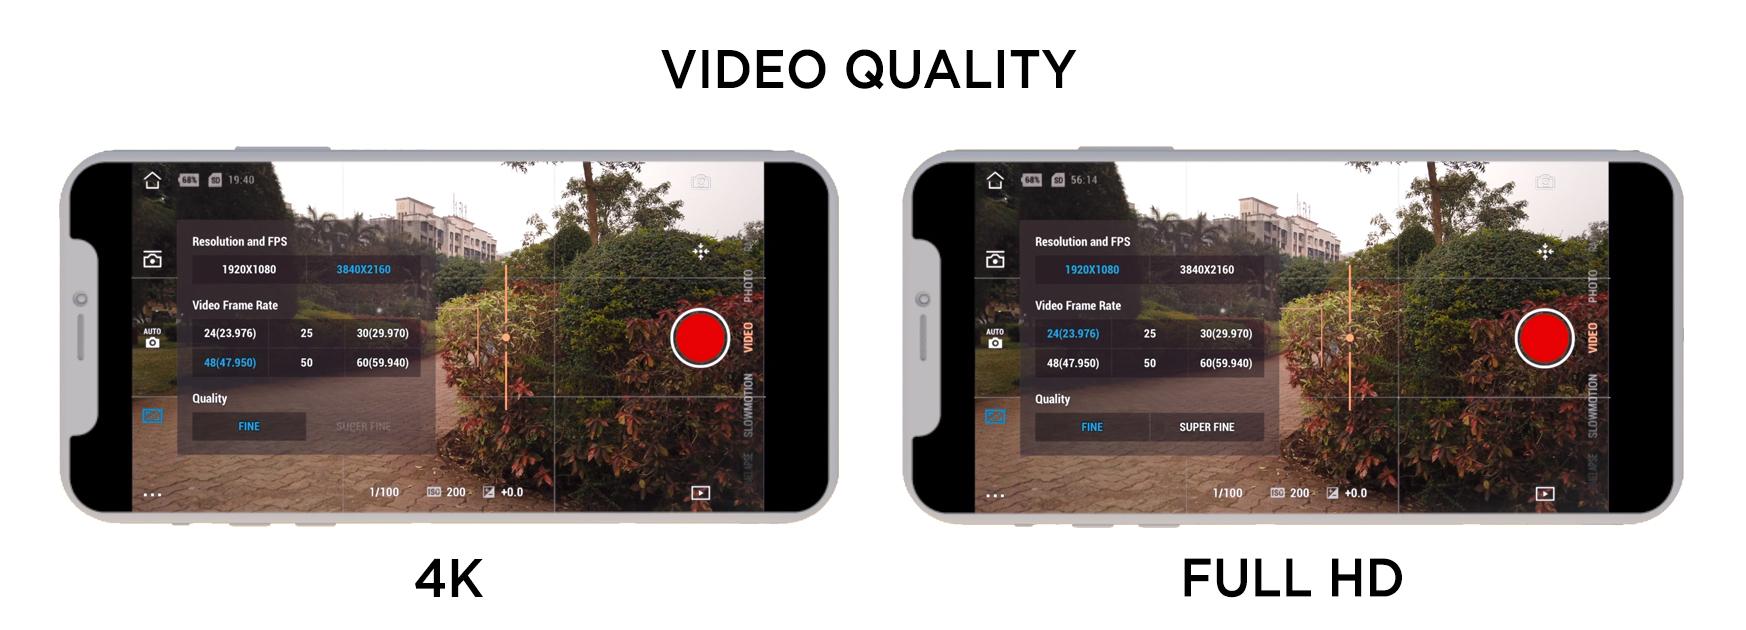 dji_osmo_pocket_4k_video_camera_dji_gimbal_camera